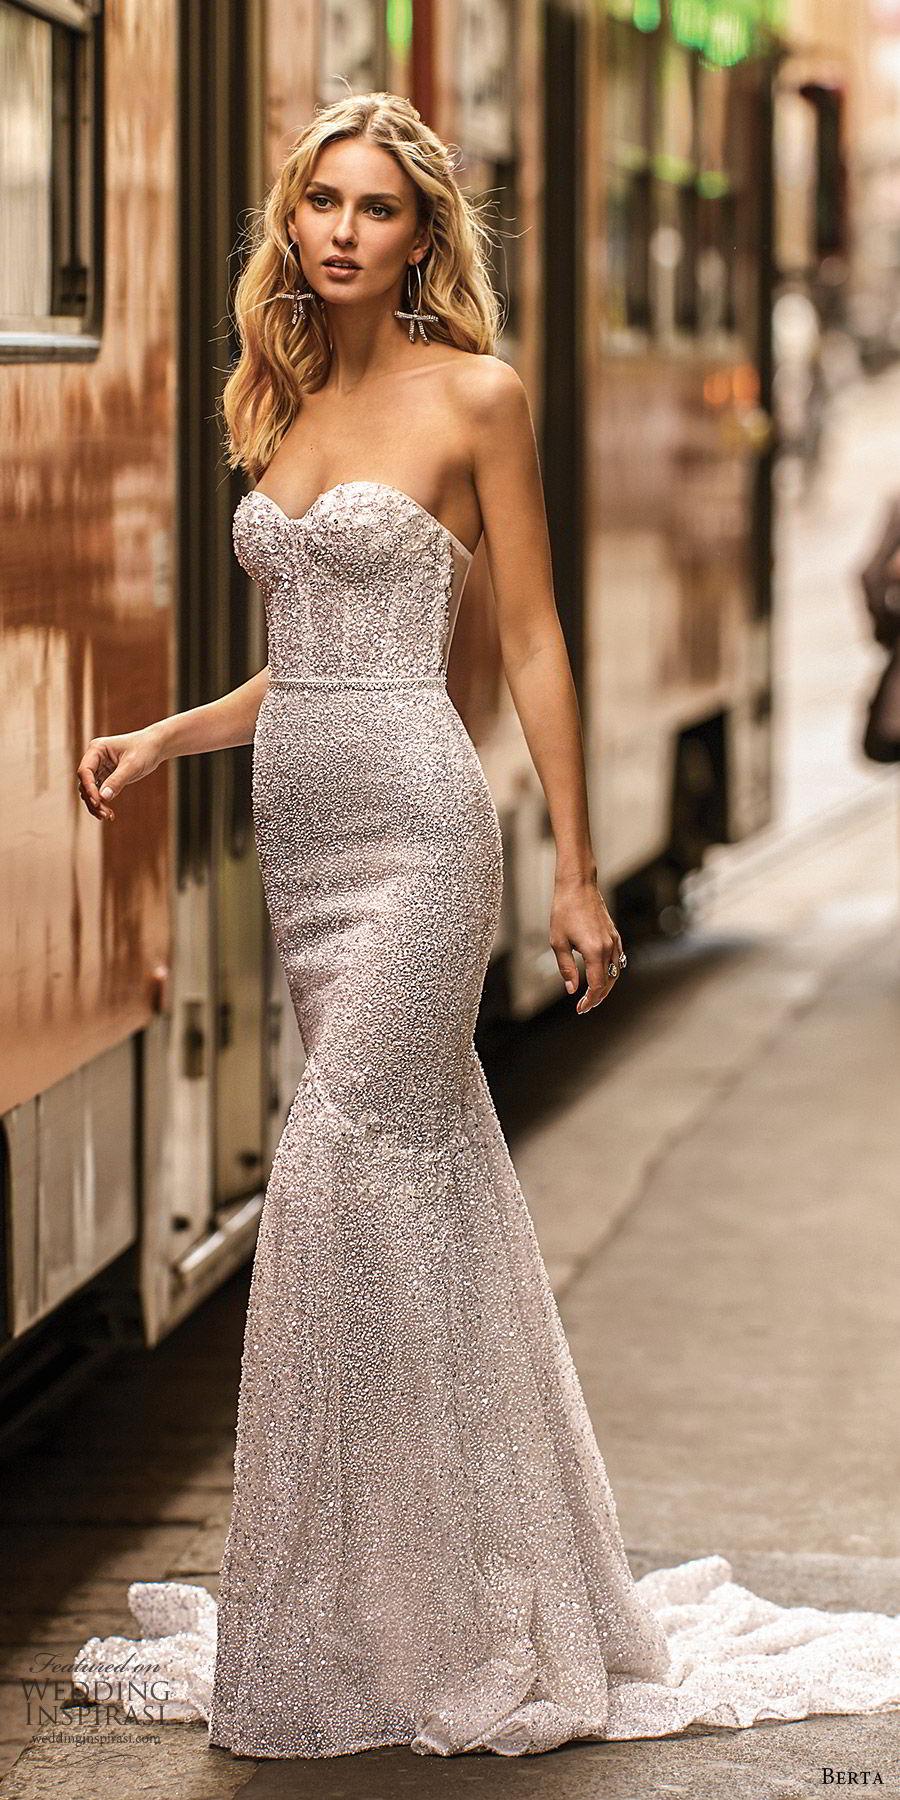 berta spring 2020 bridal strapless sweetheart fully embellished mermaid sheath wedding dress (16) glitzy elegant sheer back chapel train mv